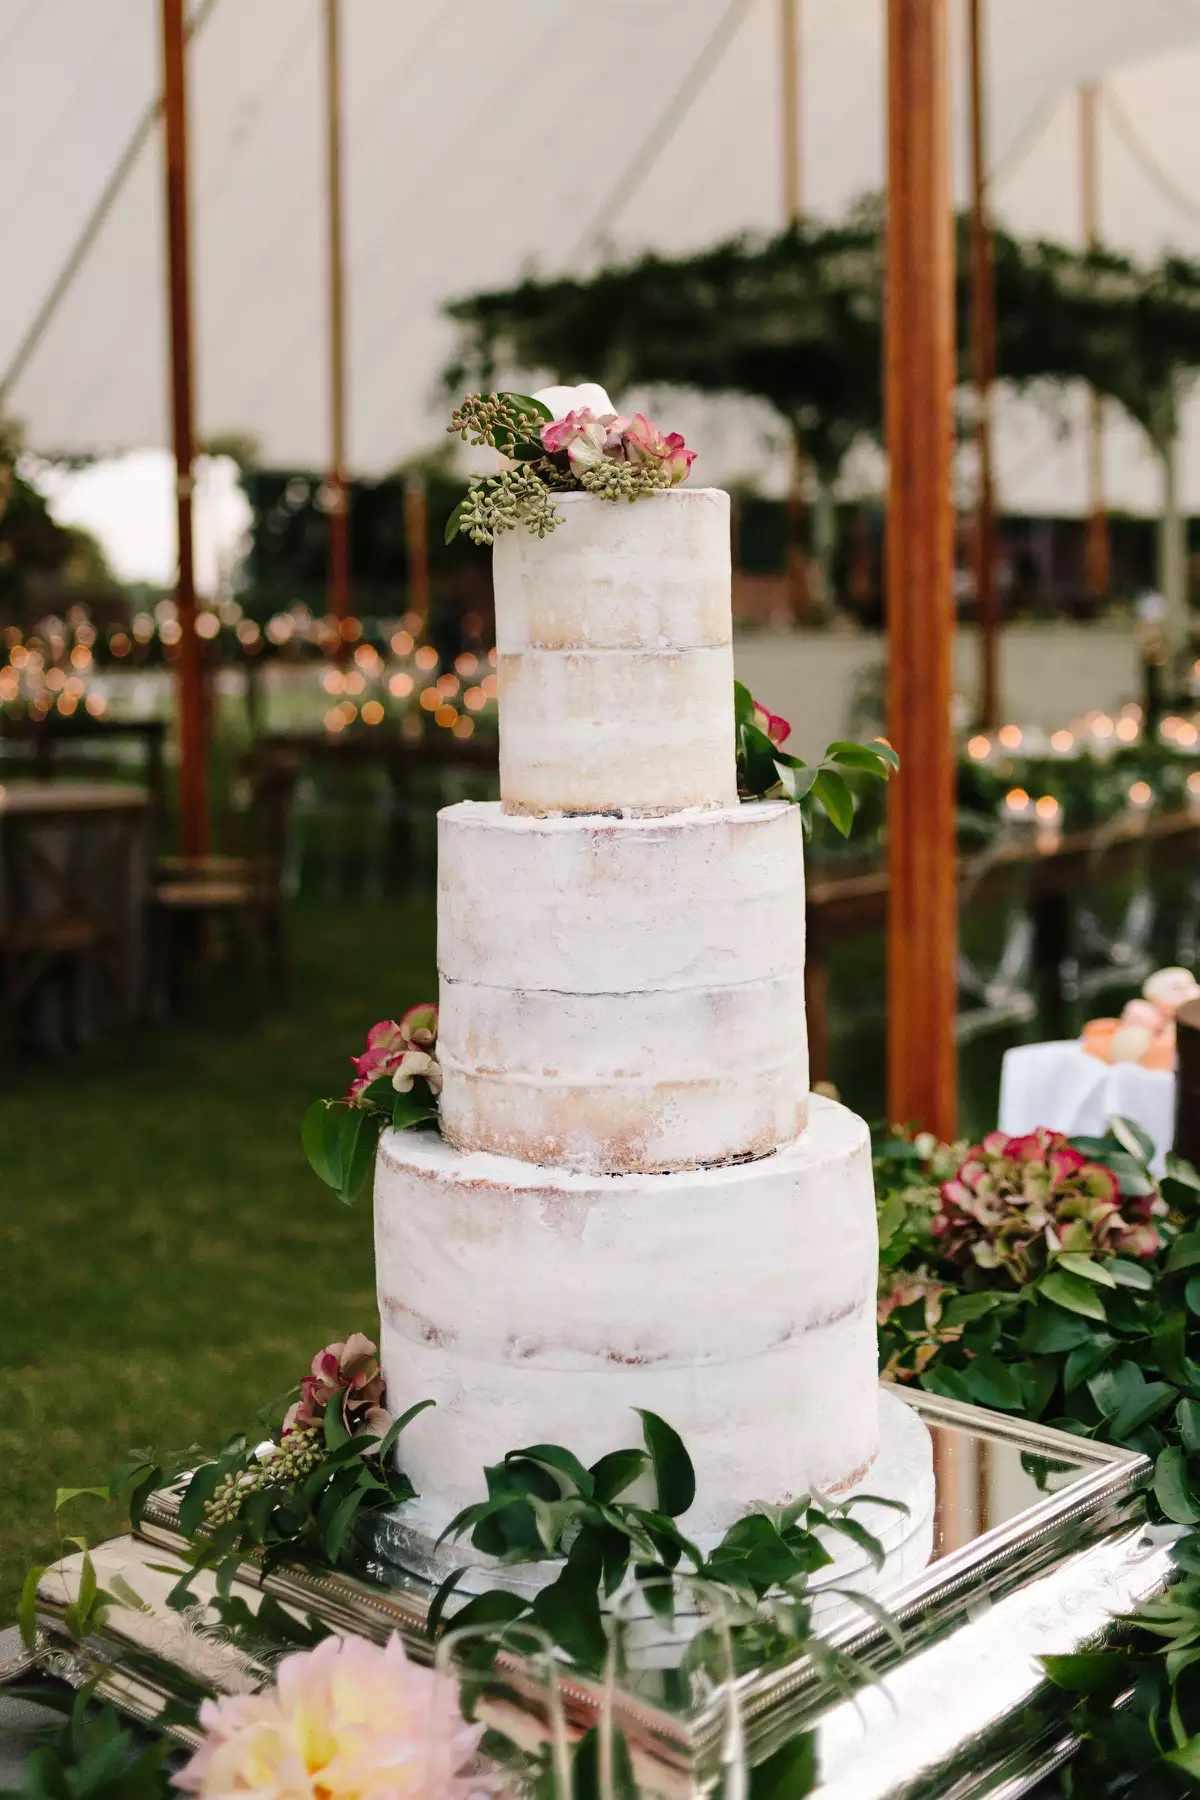 tall semi-naked wedding cake on mirror